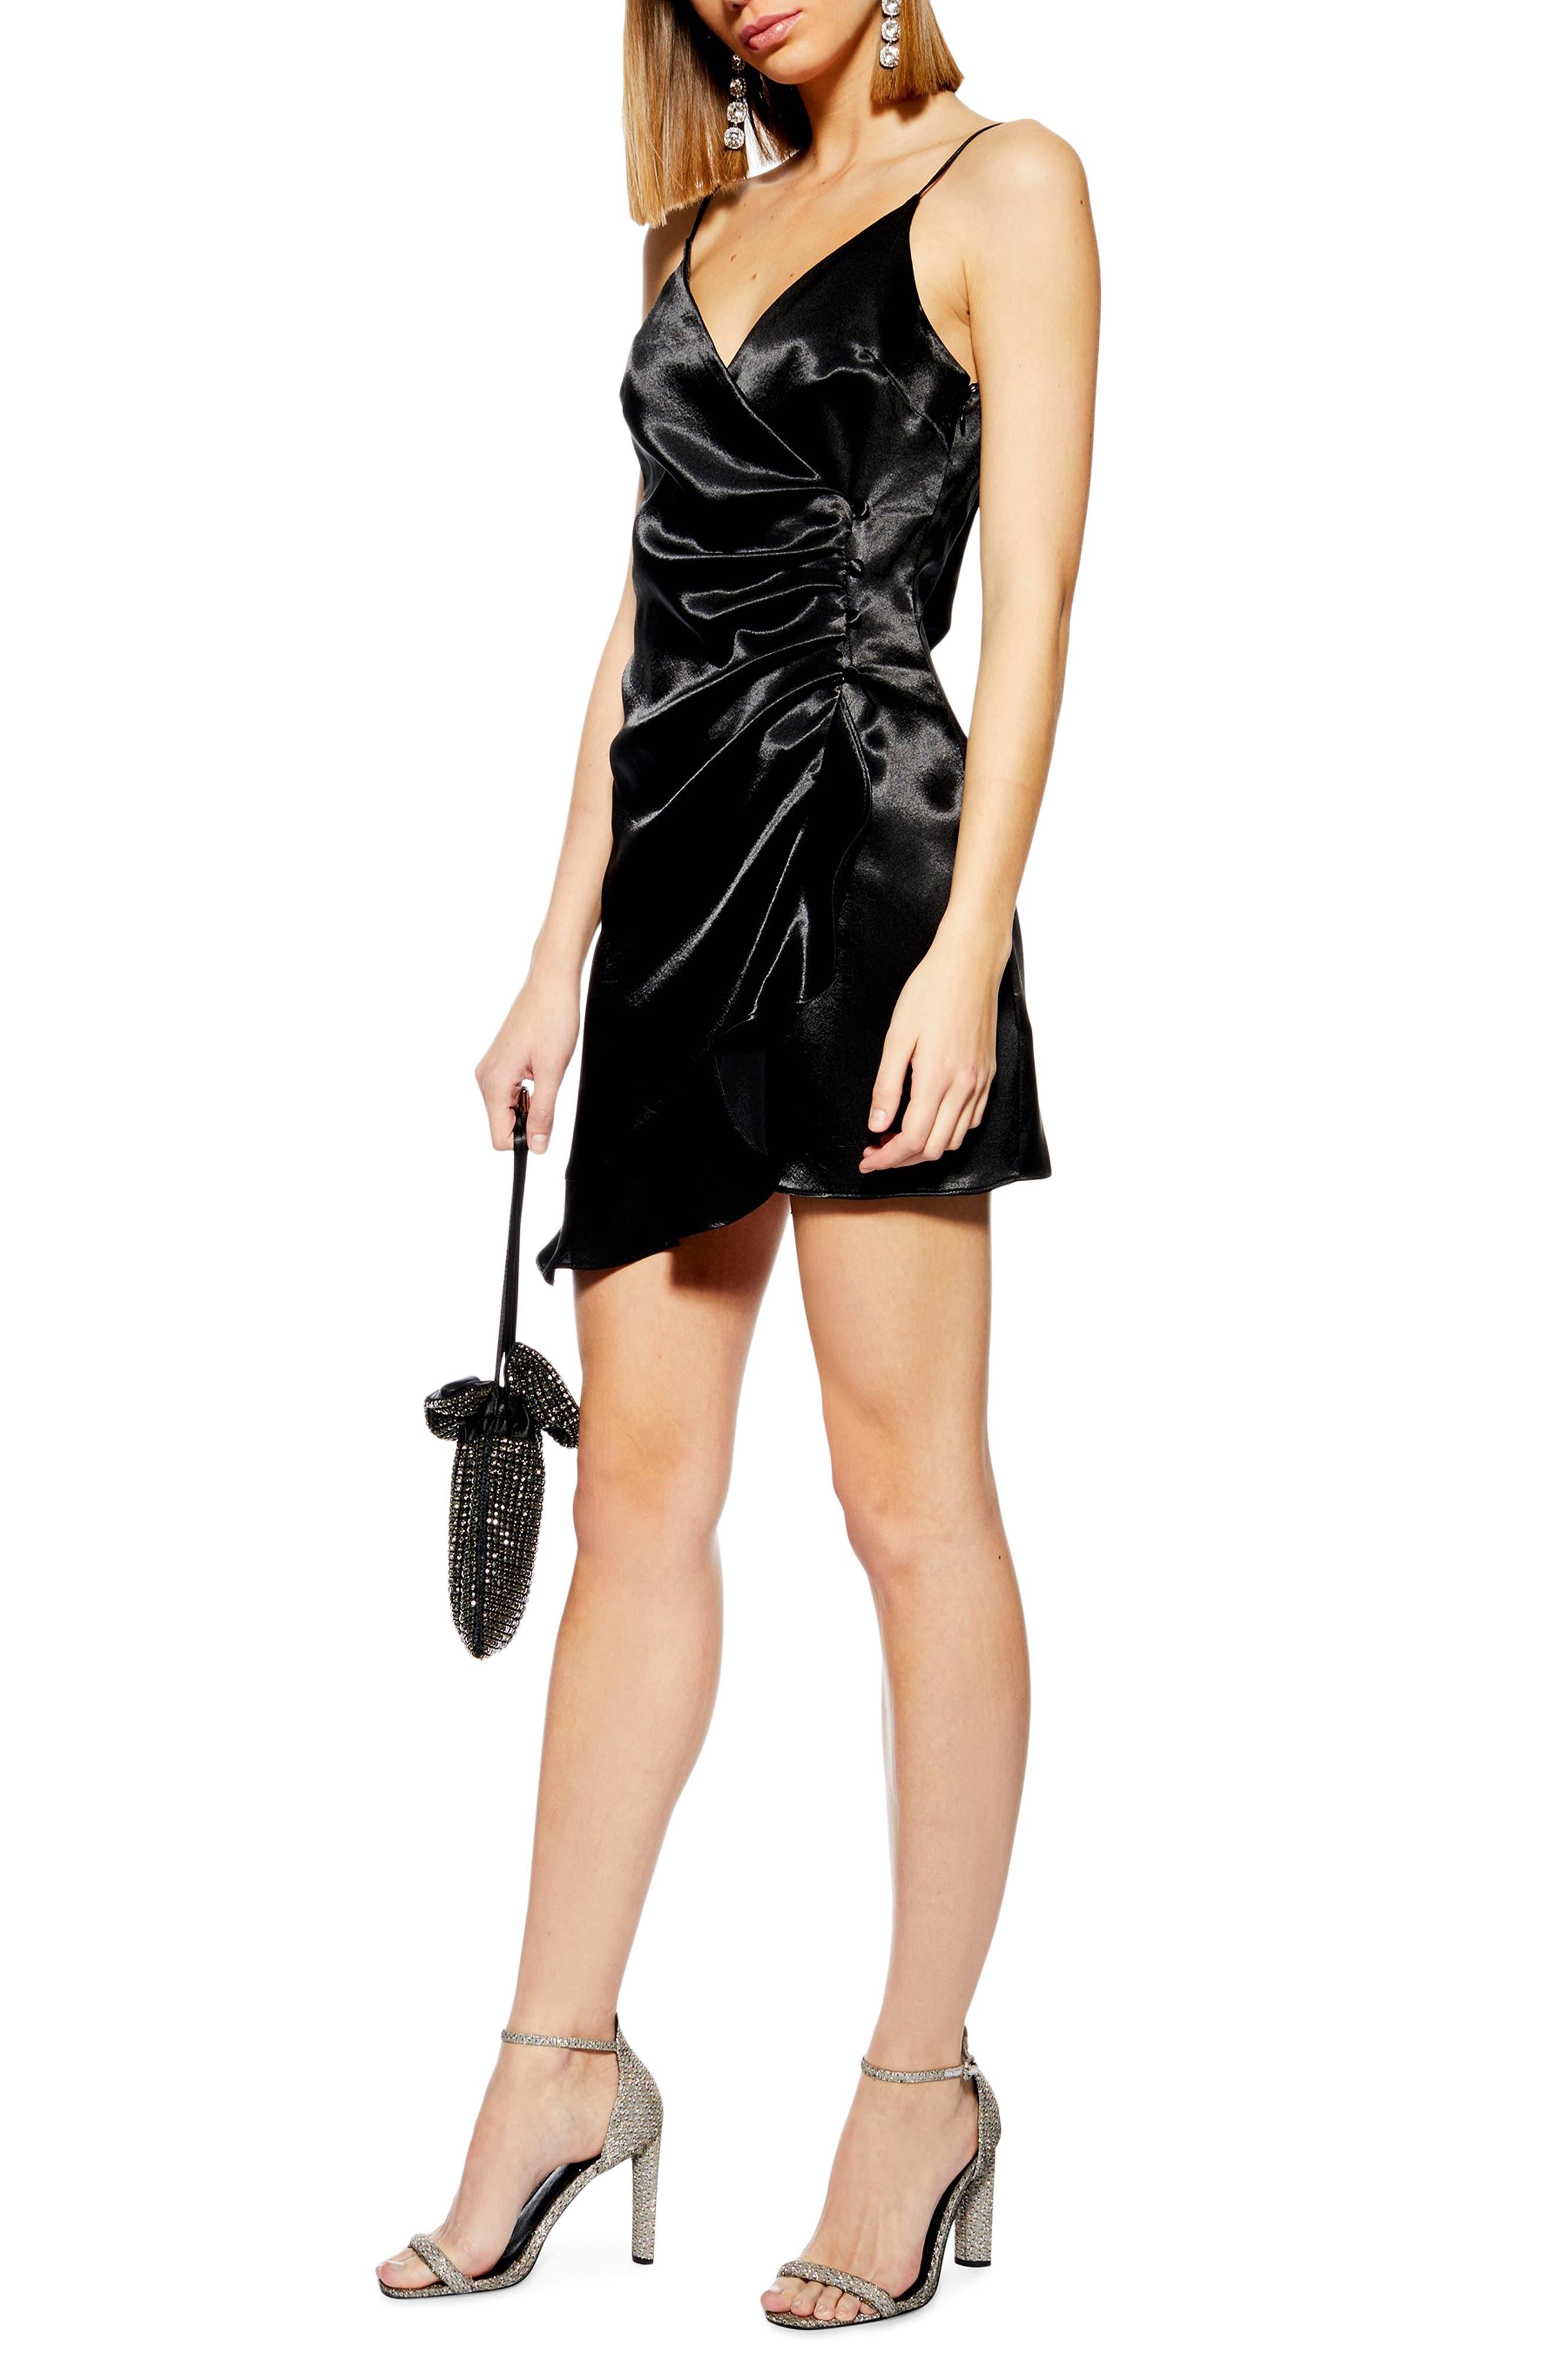 Topshop Ruched Satin Minidress, US (fits like 14) - Black